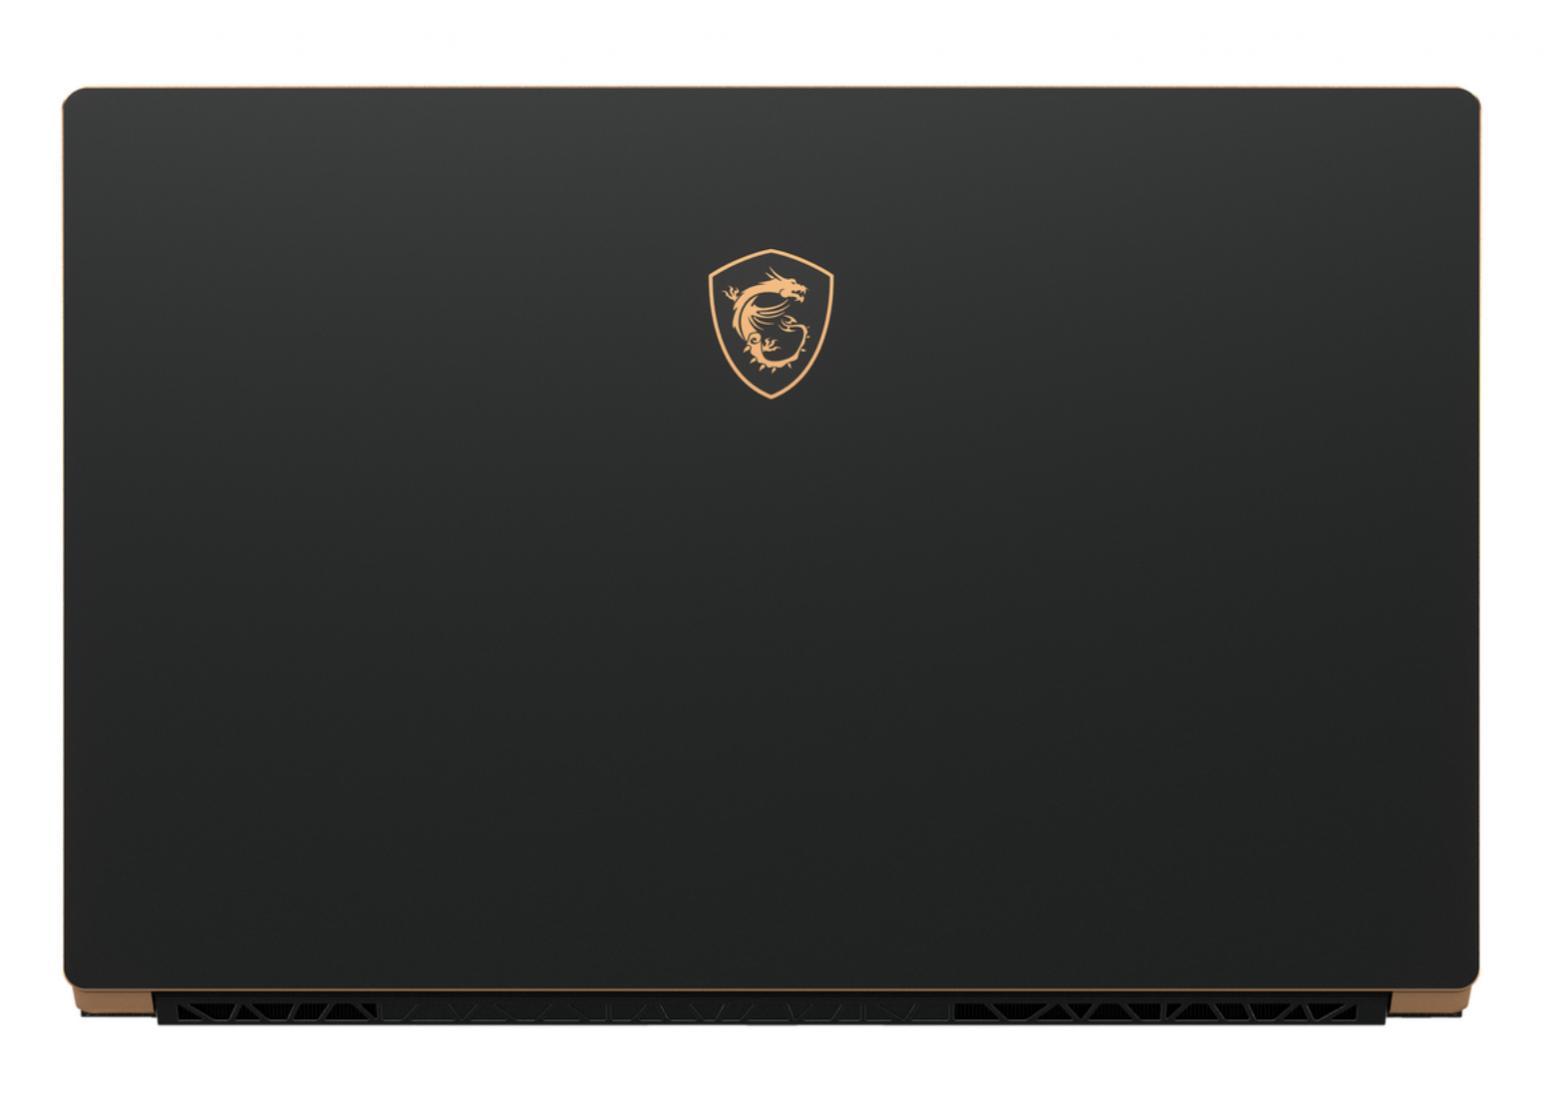 Ordinateur portable MSI GS75 10SE-1029FR Stealth - 4K mini-LED, RTX 2060 - photo 5